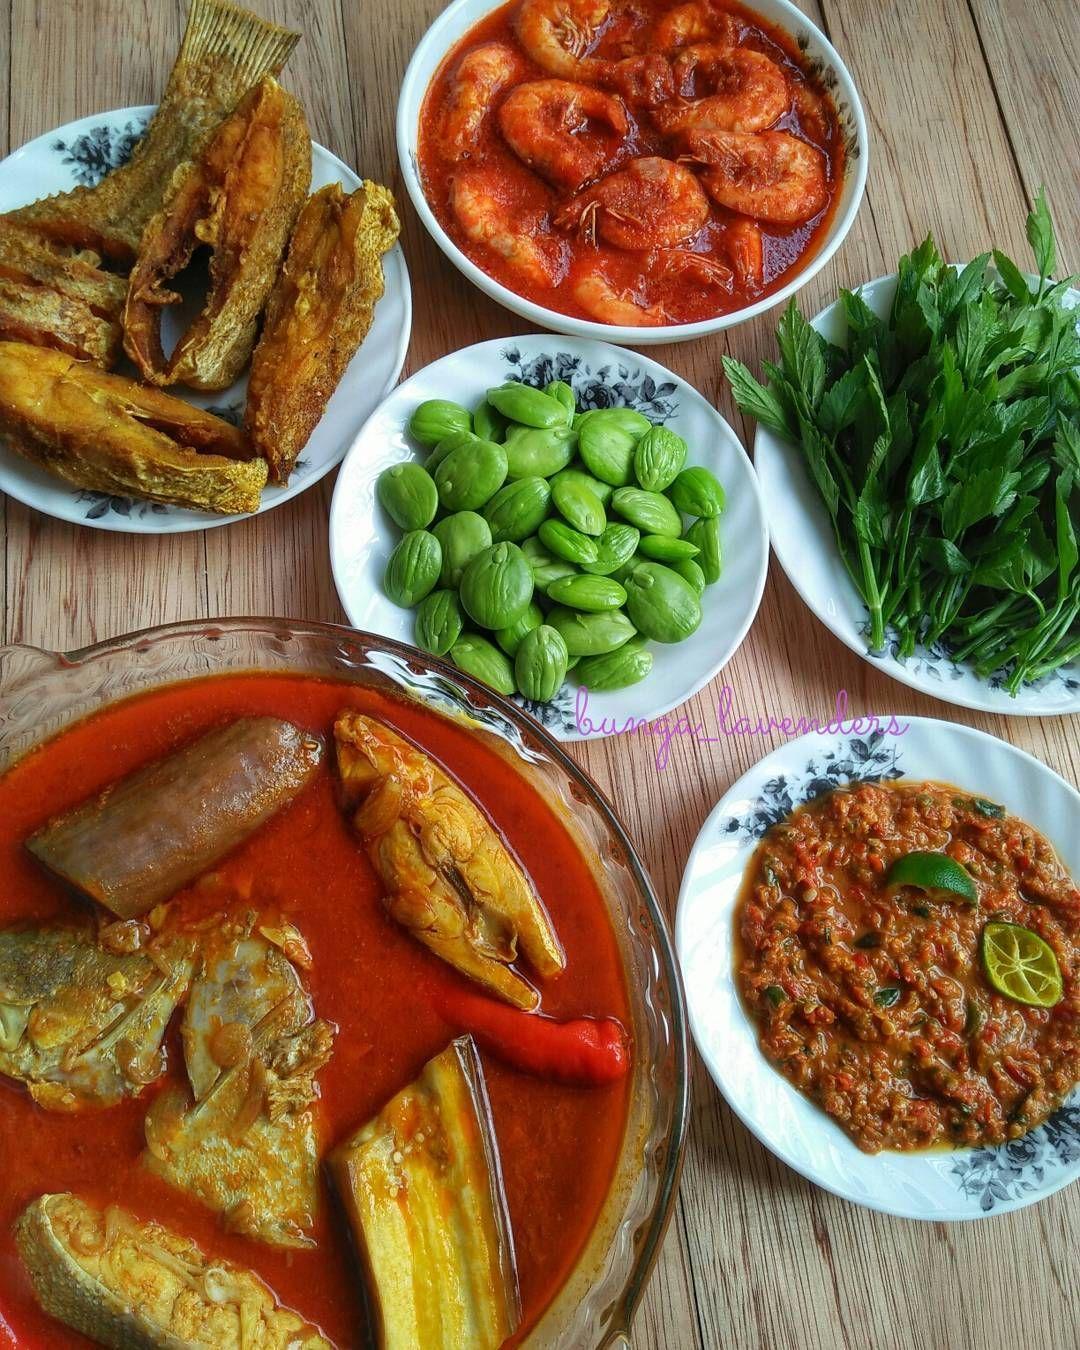 Assalammualaikum Happy Weekend Peeps Menu Hri Ni Gulai Ikan Kaci Sambal Udang Ikan Goreng Sambal Belacan Ulam Petai Daun Selom Happy Sambal Food Lunch